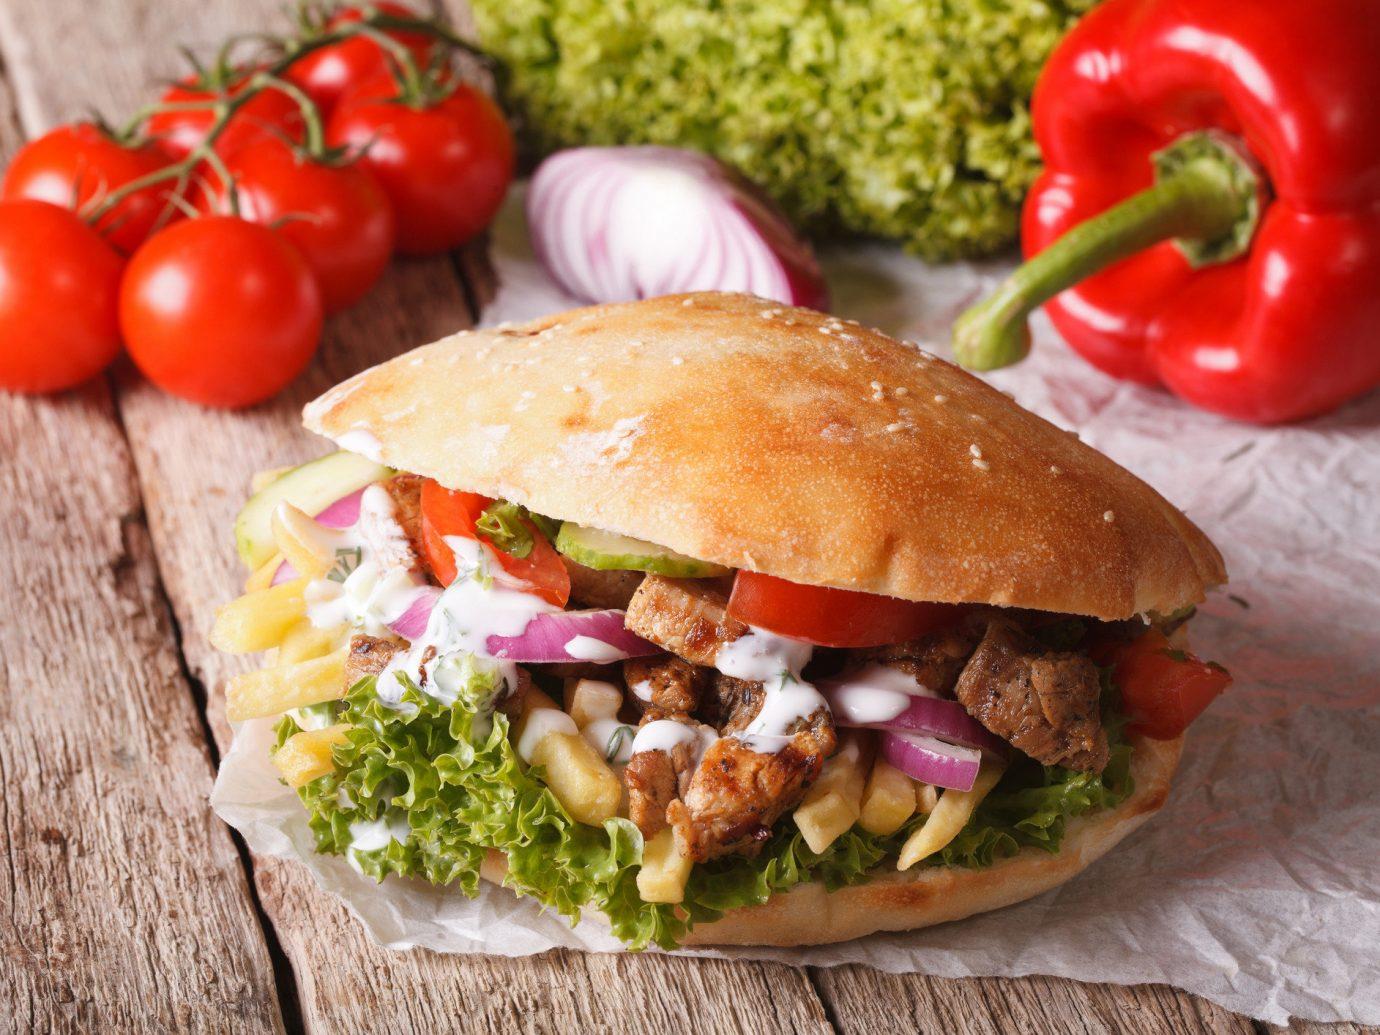 Food + Drink food dish sandwich veggie burger meat cuisine tomato snack food meal produce vegetable fresh